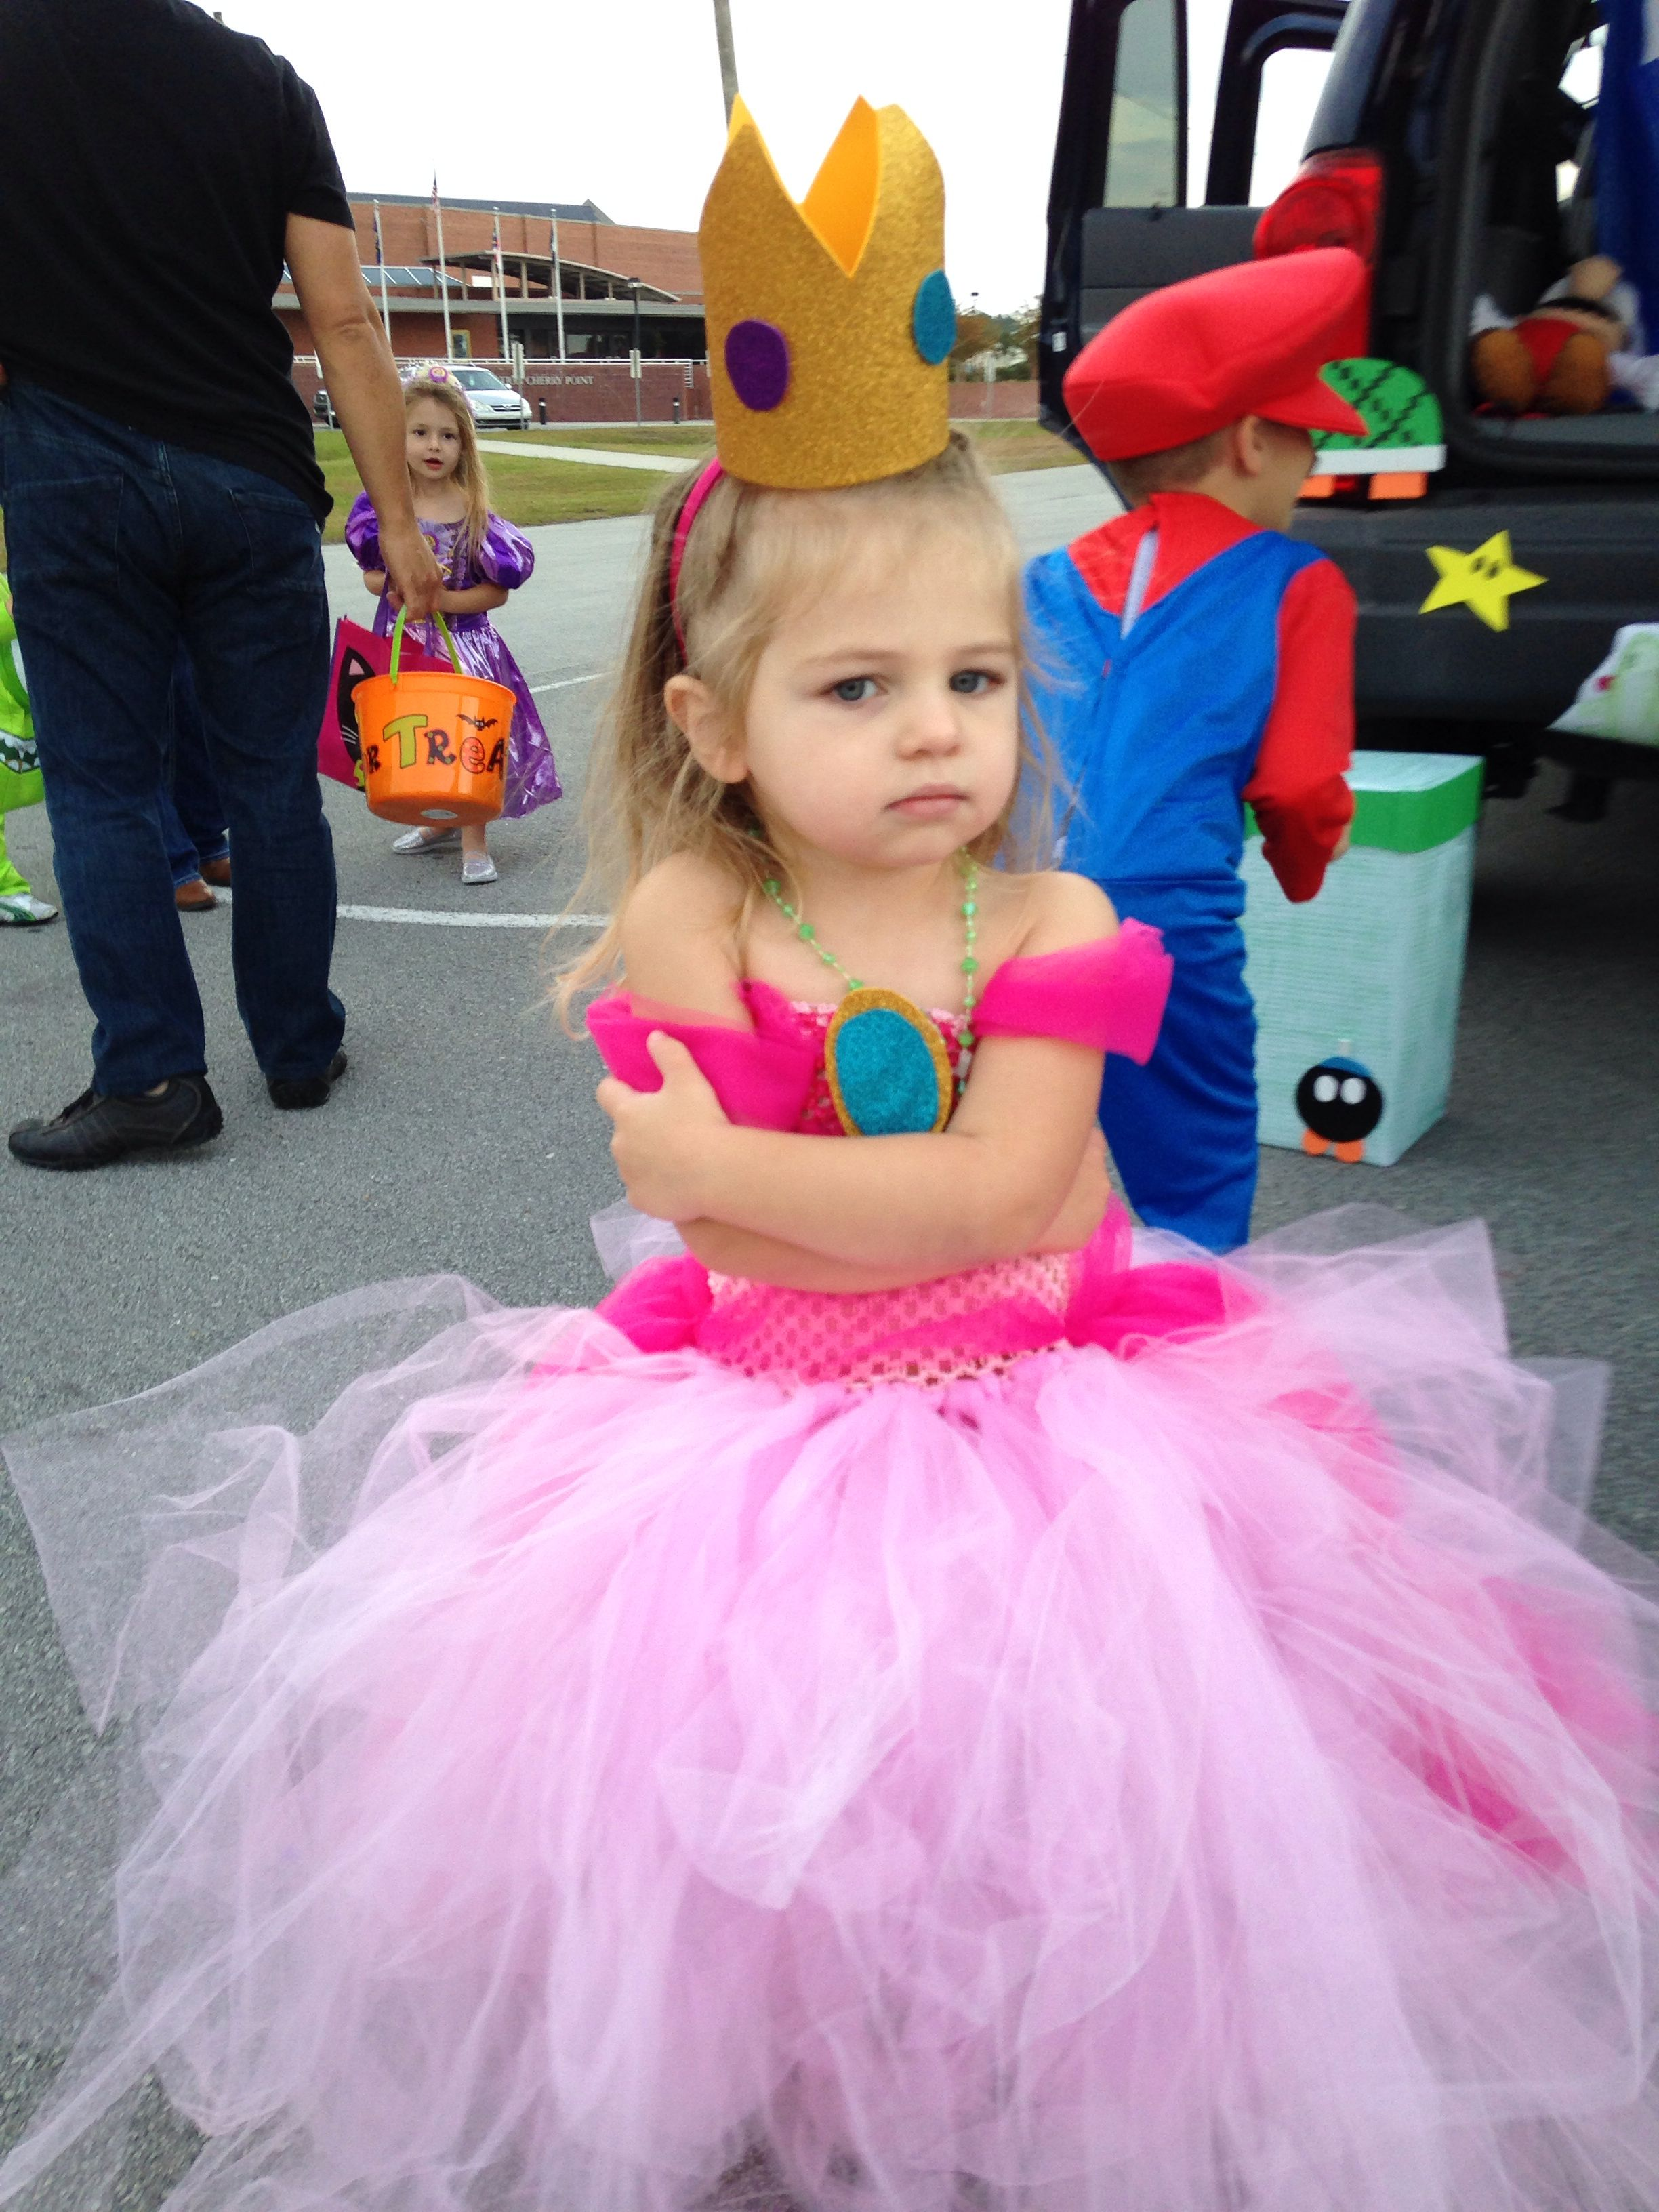 Princess peach tutu dress with foam cut outs | Disfraces | Pinterest ...